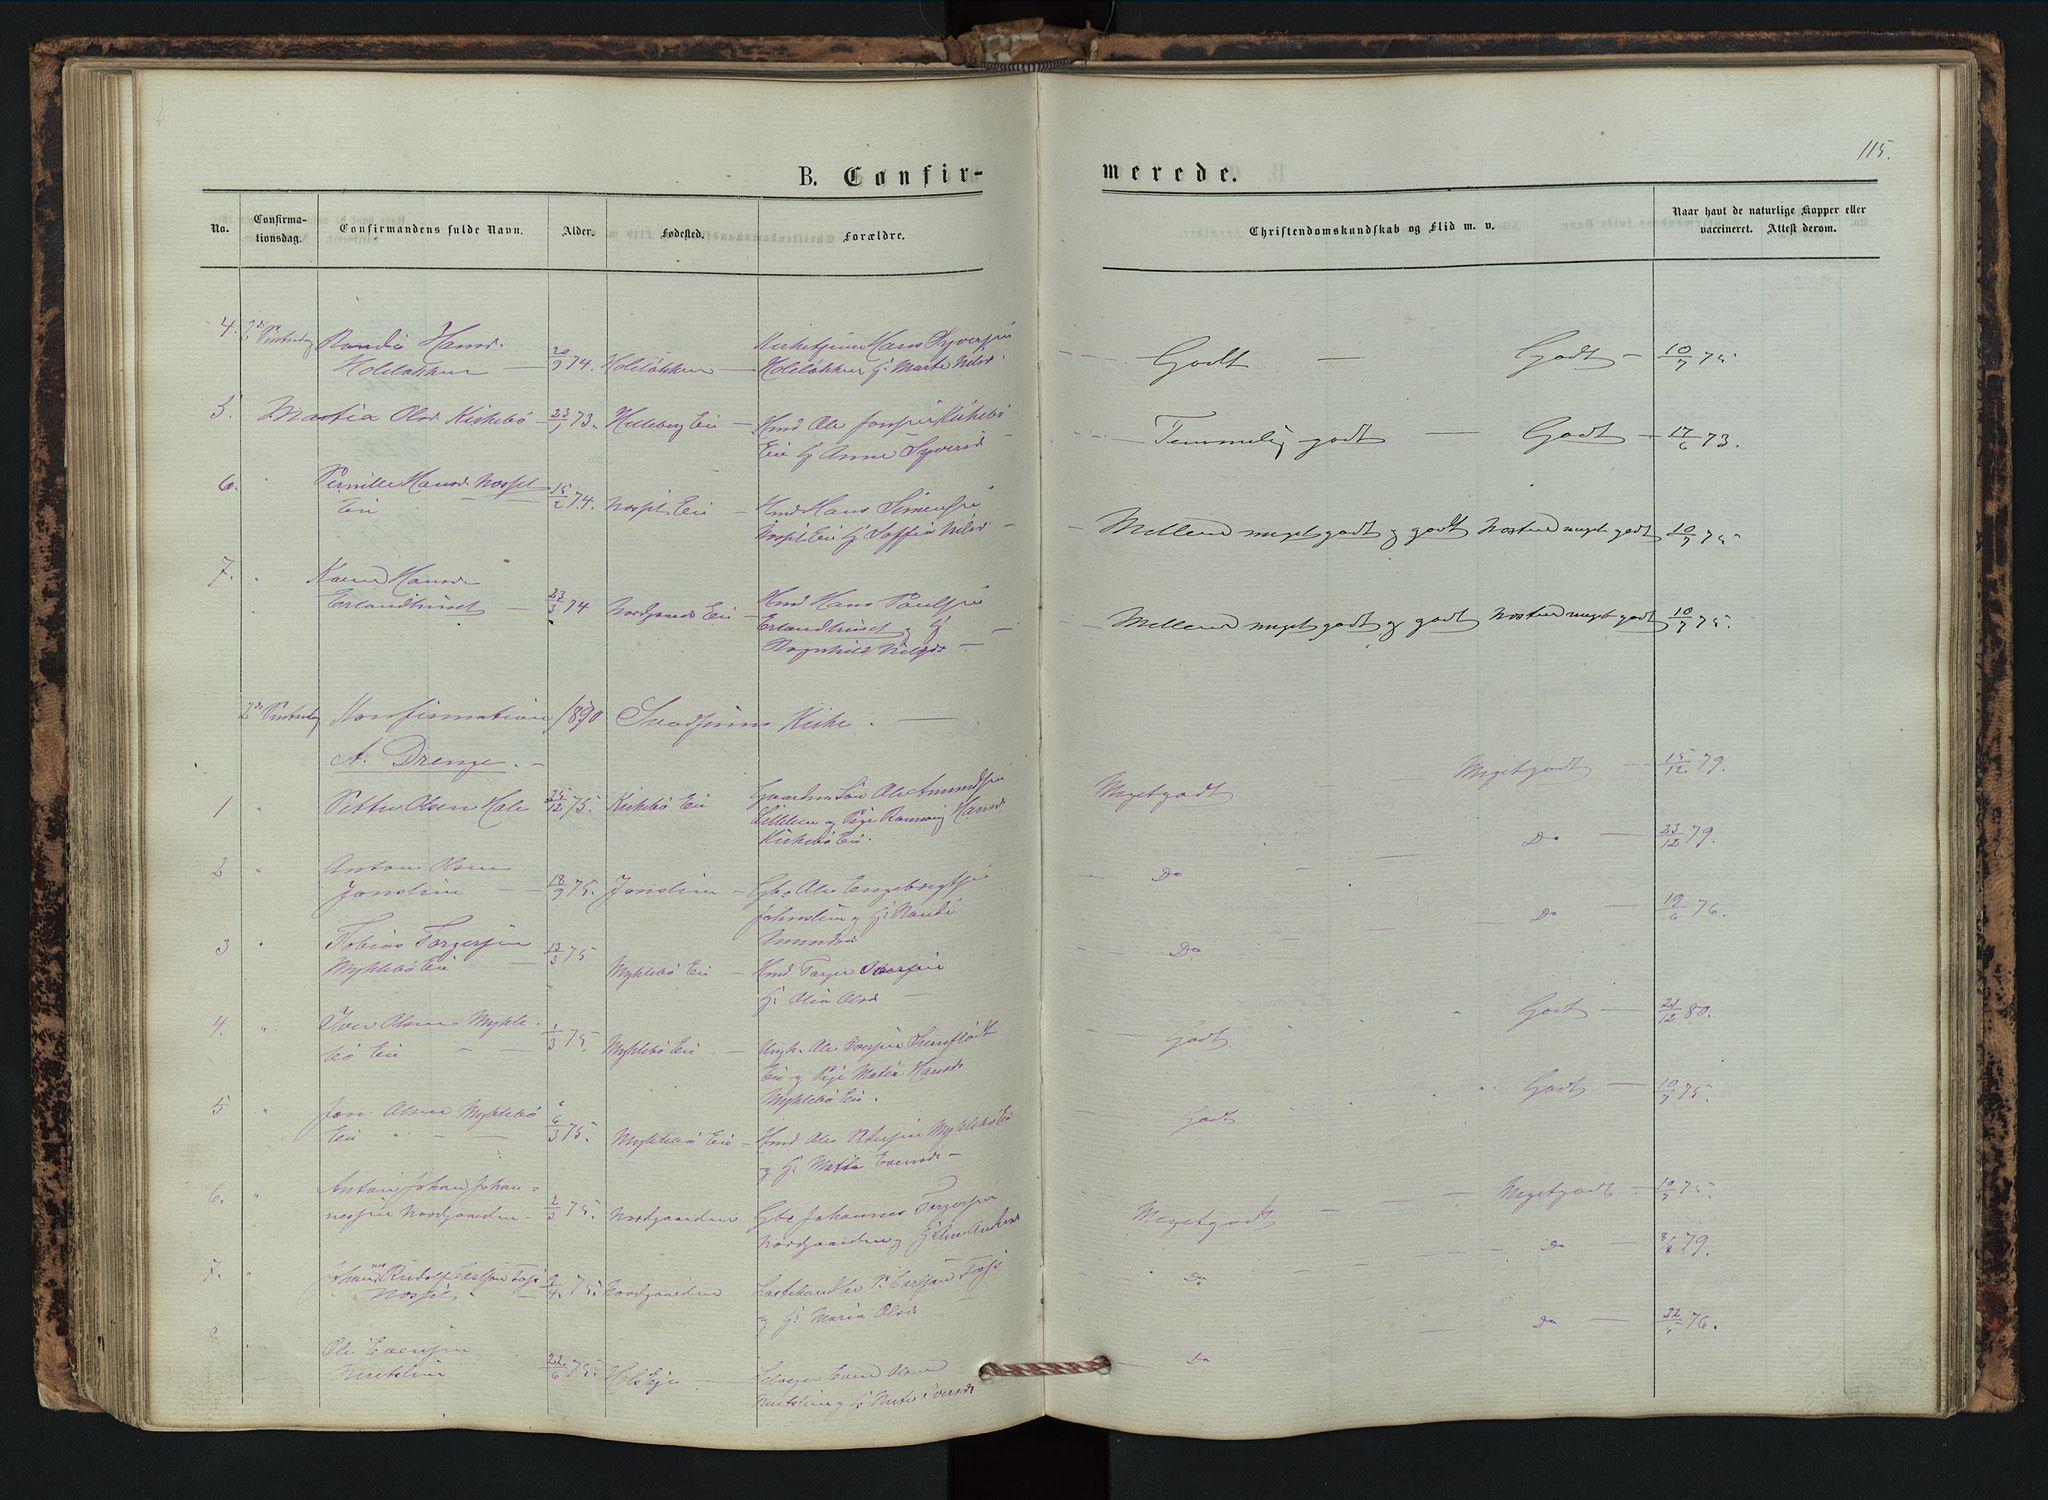 SAH, Vestre Gausdal prestekontor, Klokkerbok nr. 2, 1874-1897, s. 115